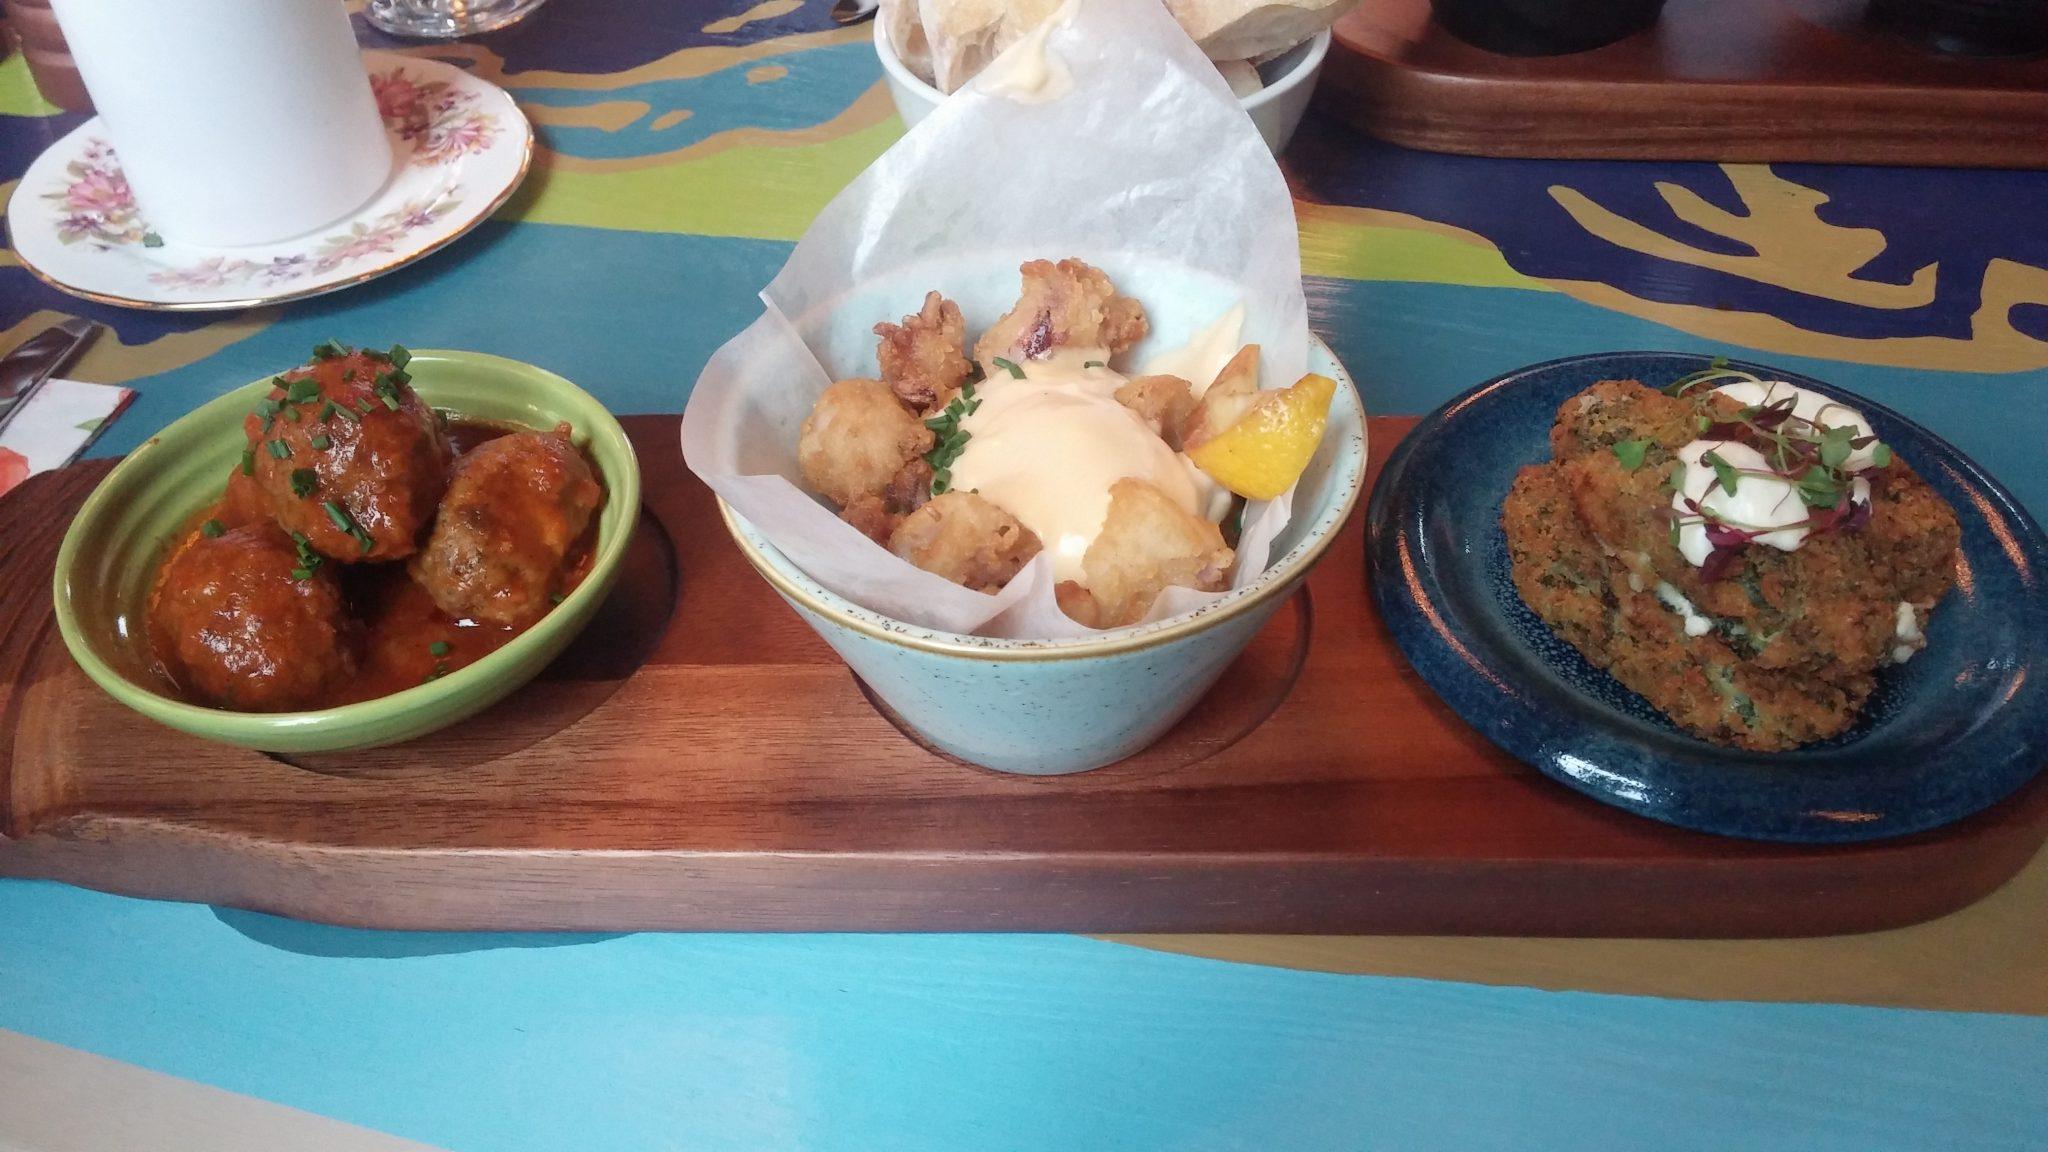 (left to right: meatballs, squid, croquettes)